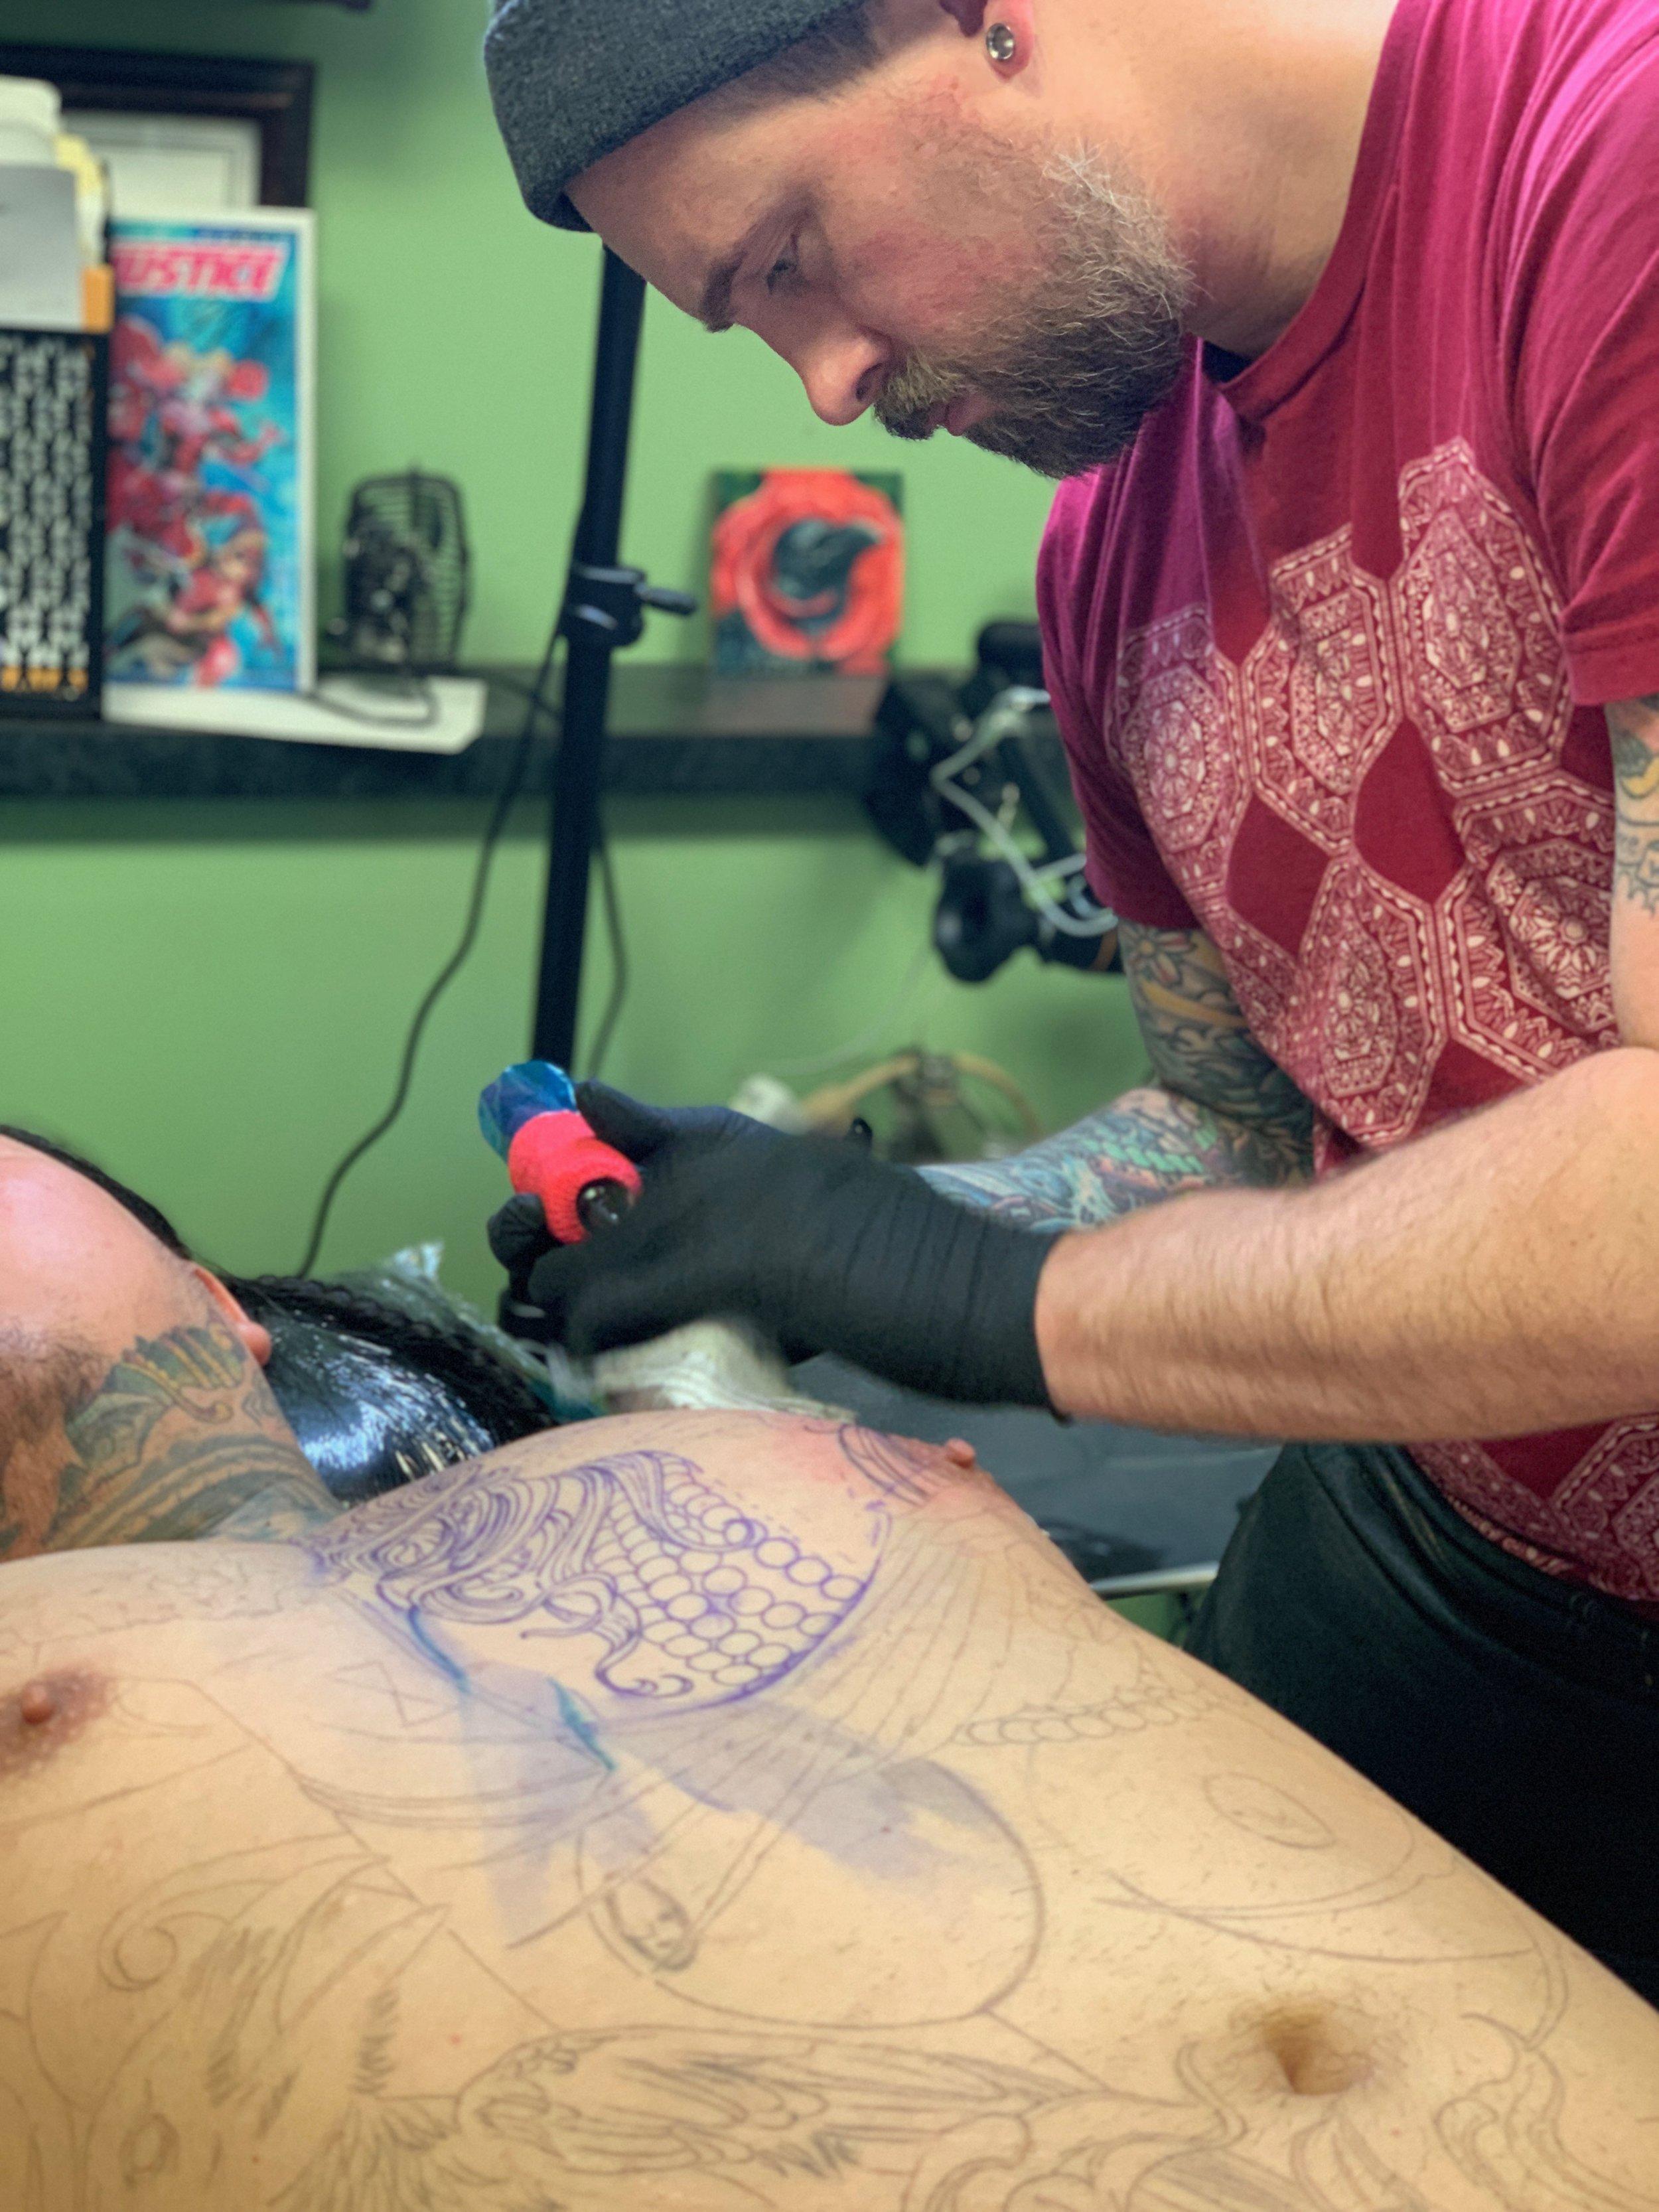 Pacheco, Angel - @angel_pacheco_  - My Co worker full torso_0391.jpg